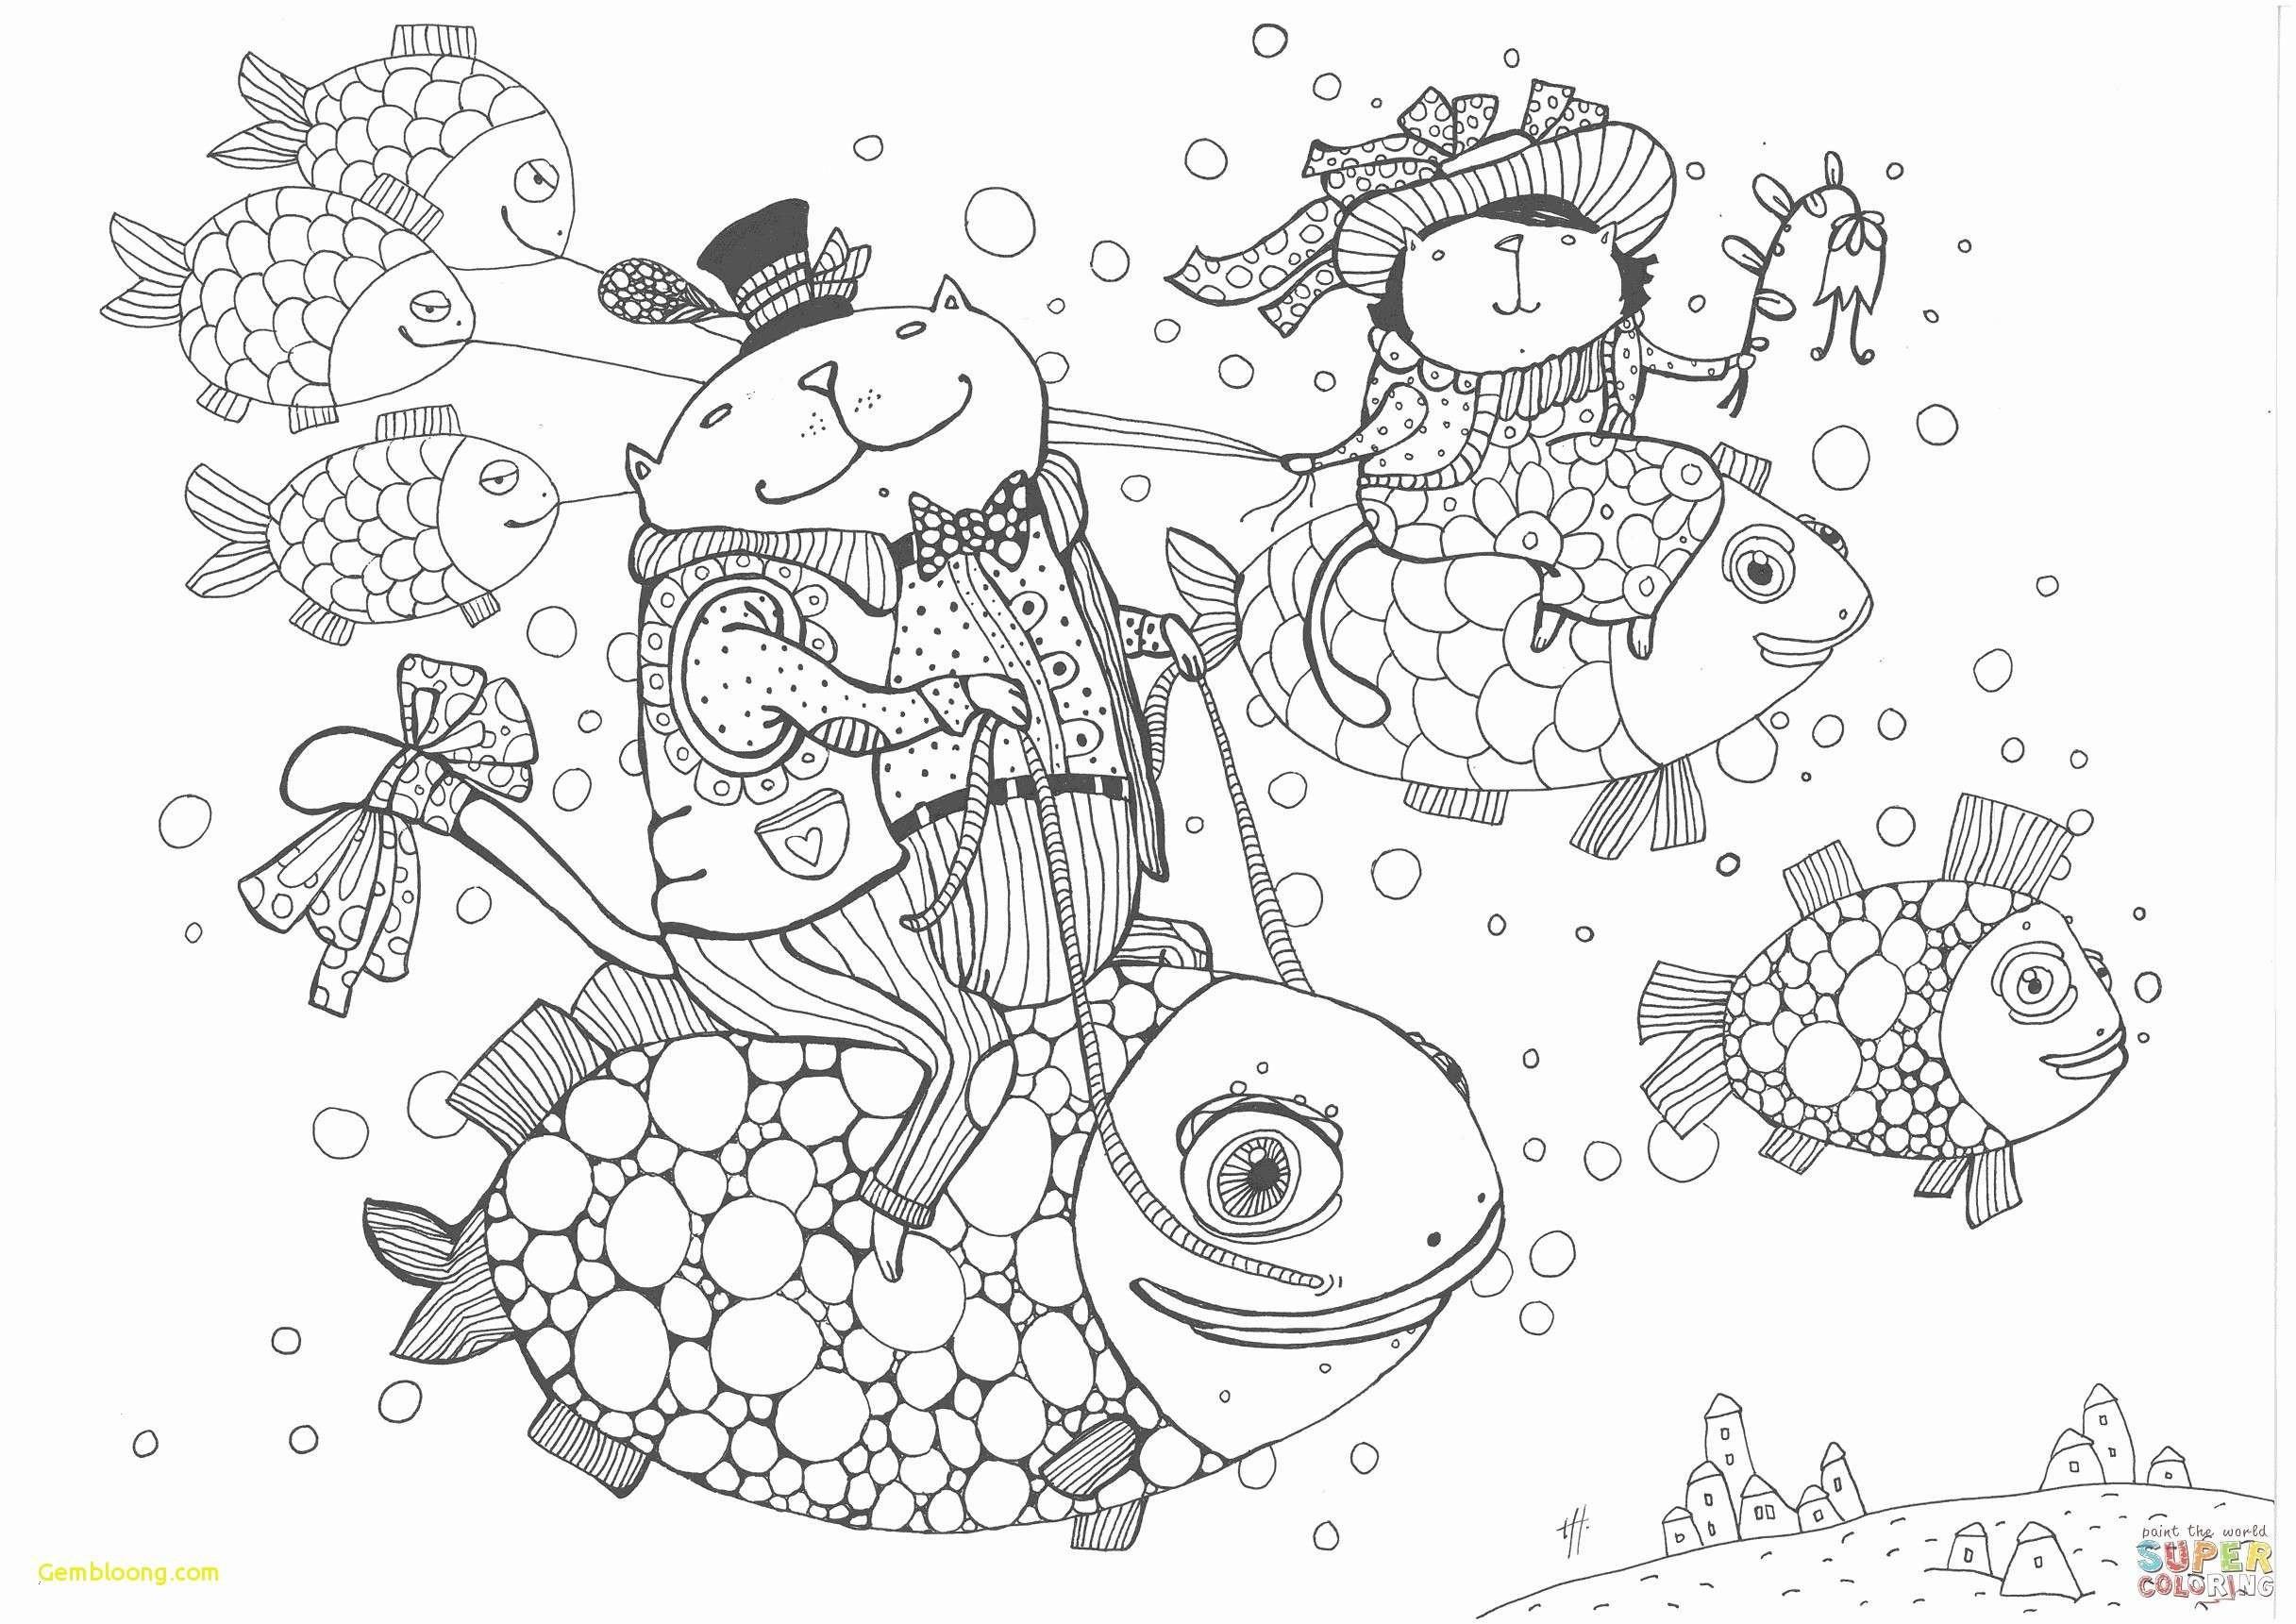 Ausmalbild Hello Kitty Neu Ausmalbilder Hello Kitty Weihnachten Best Ausmalbild Elfe Das Bild